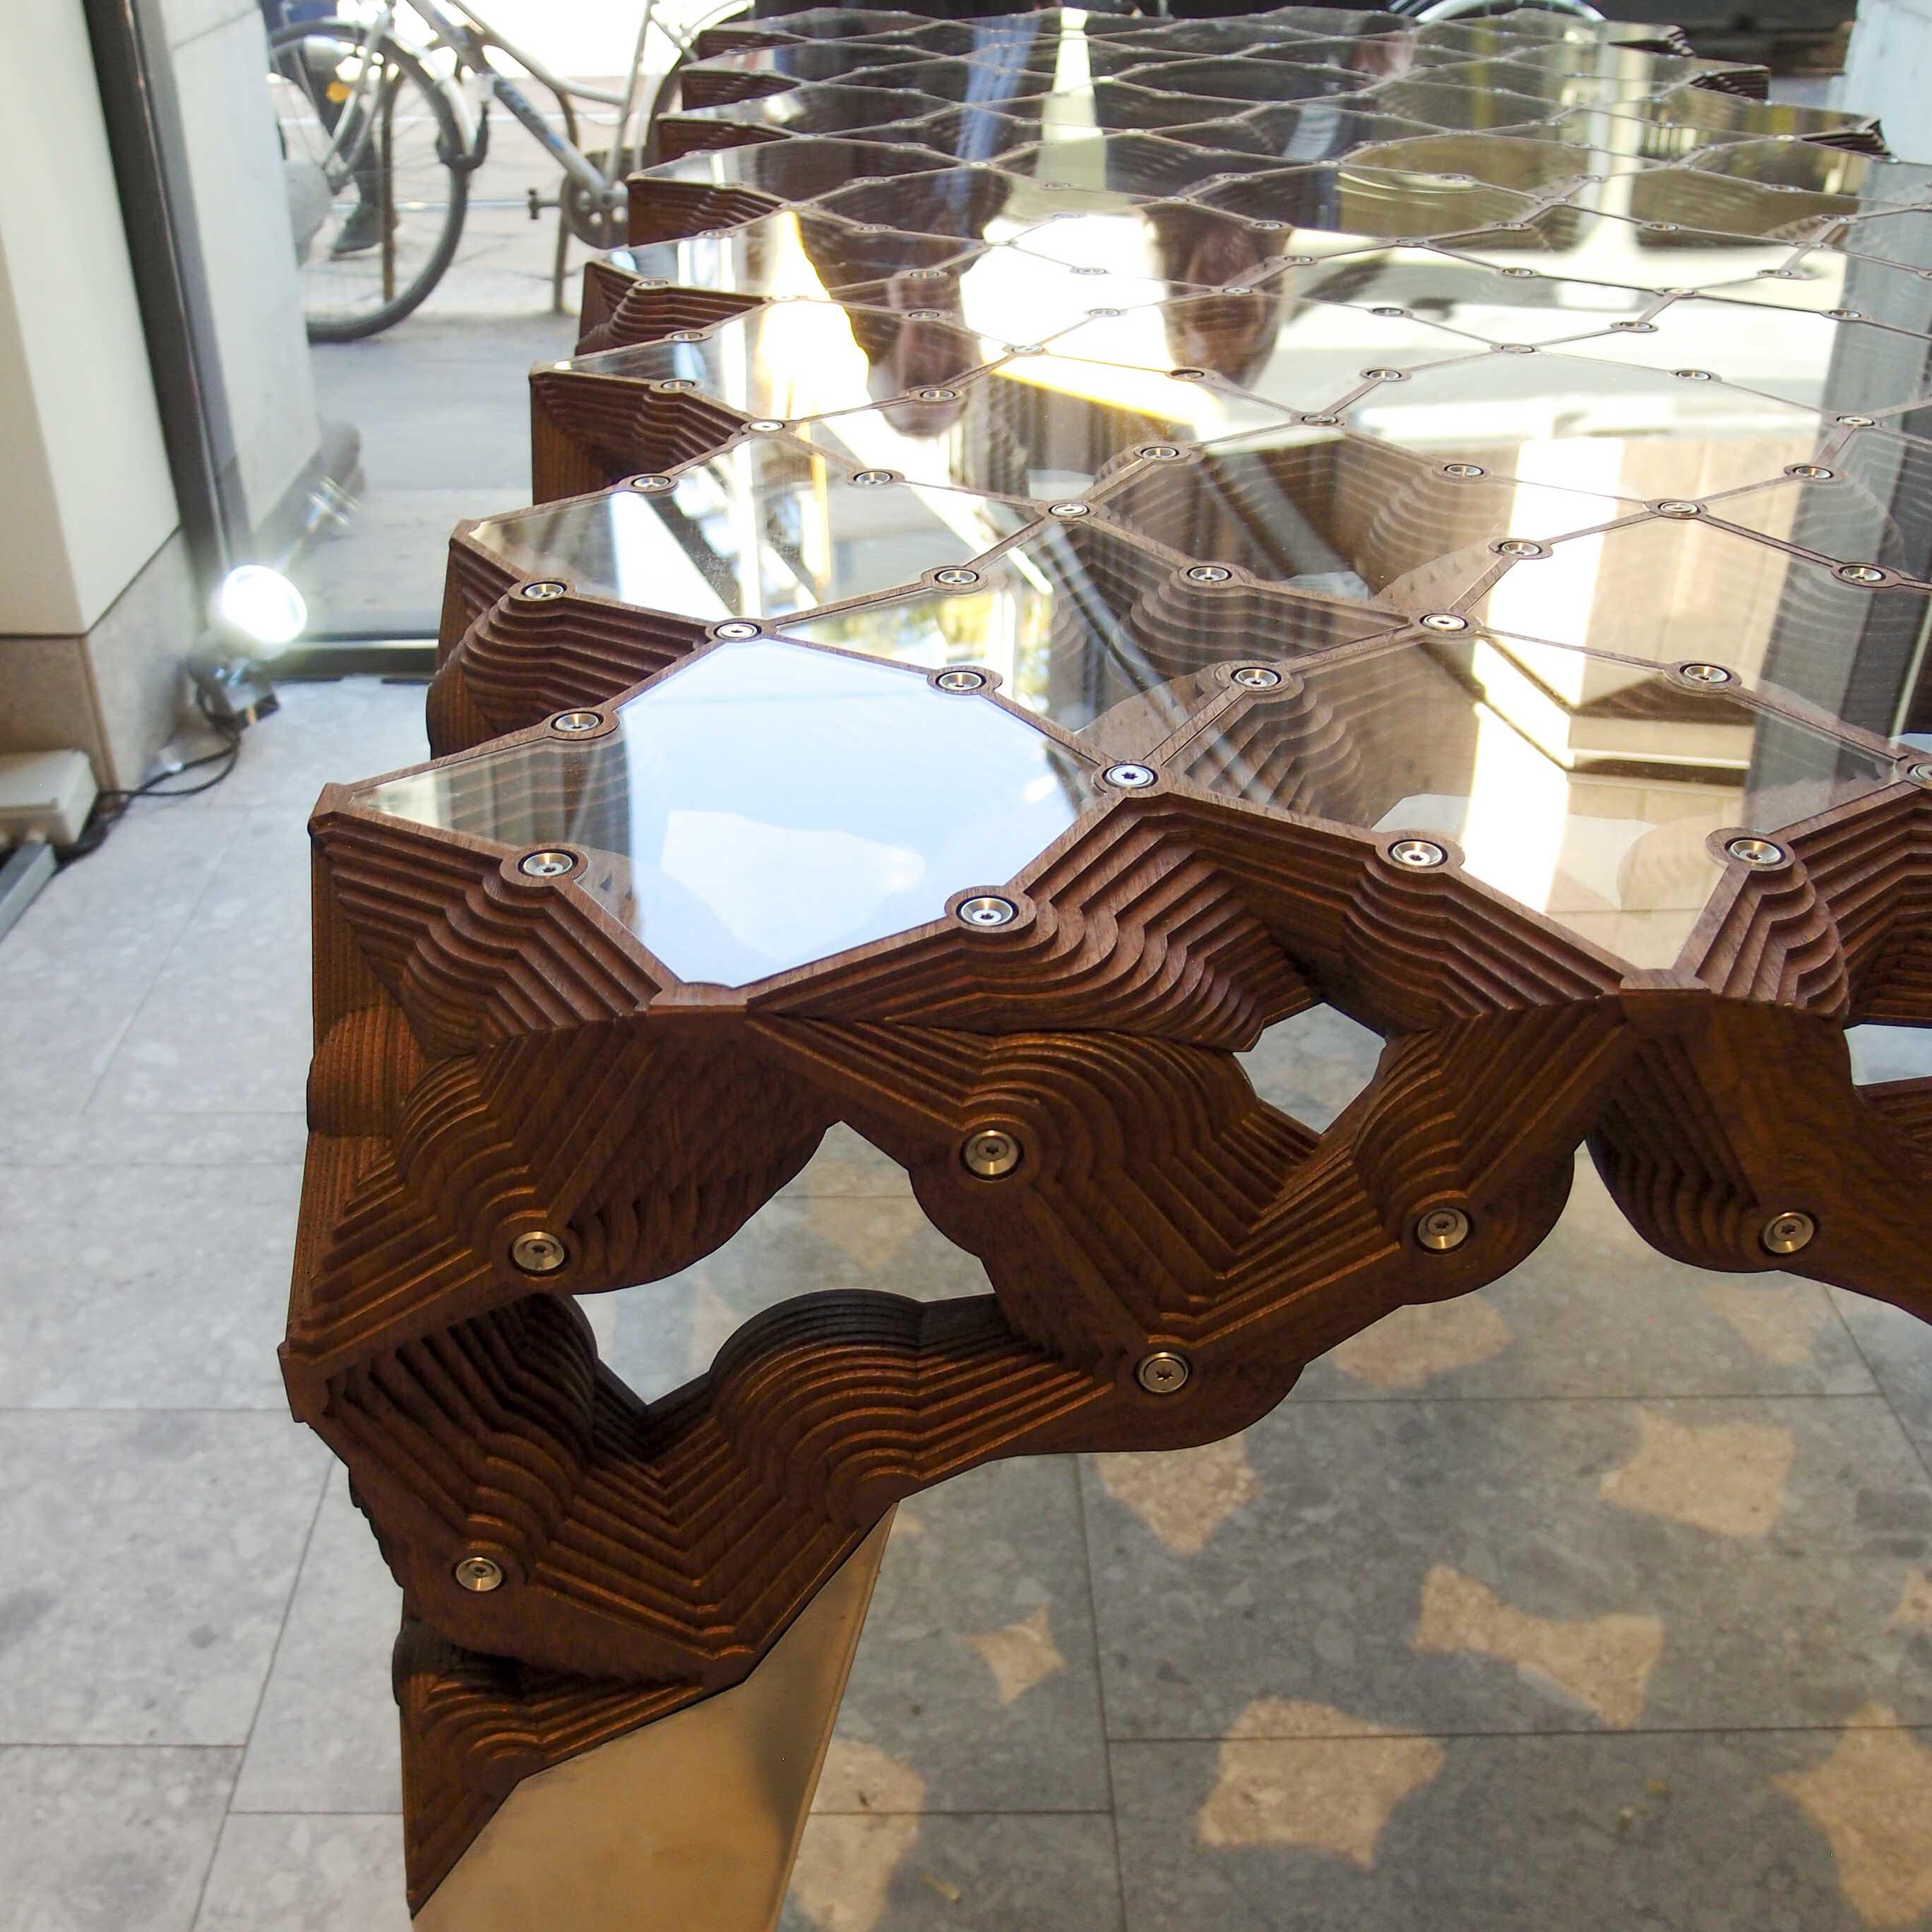 Masterly, The Dutch in Milan: il tavolo scultura Le Reflet di Sven Hulsbergen Henning per HenningMade